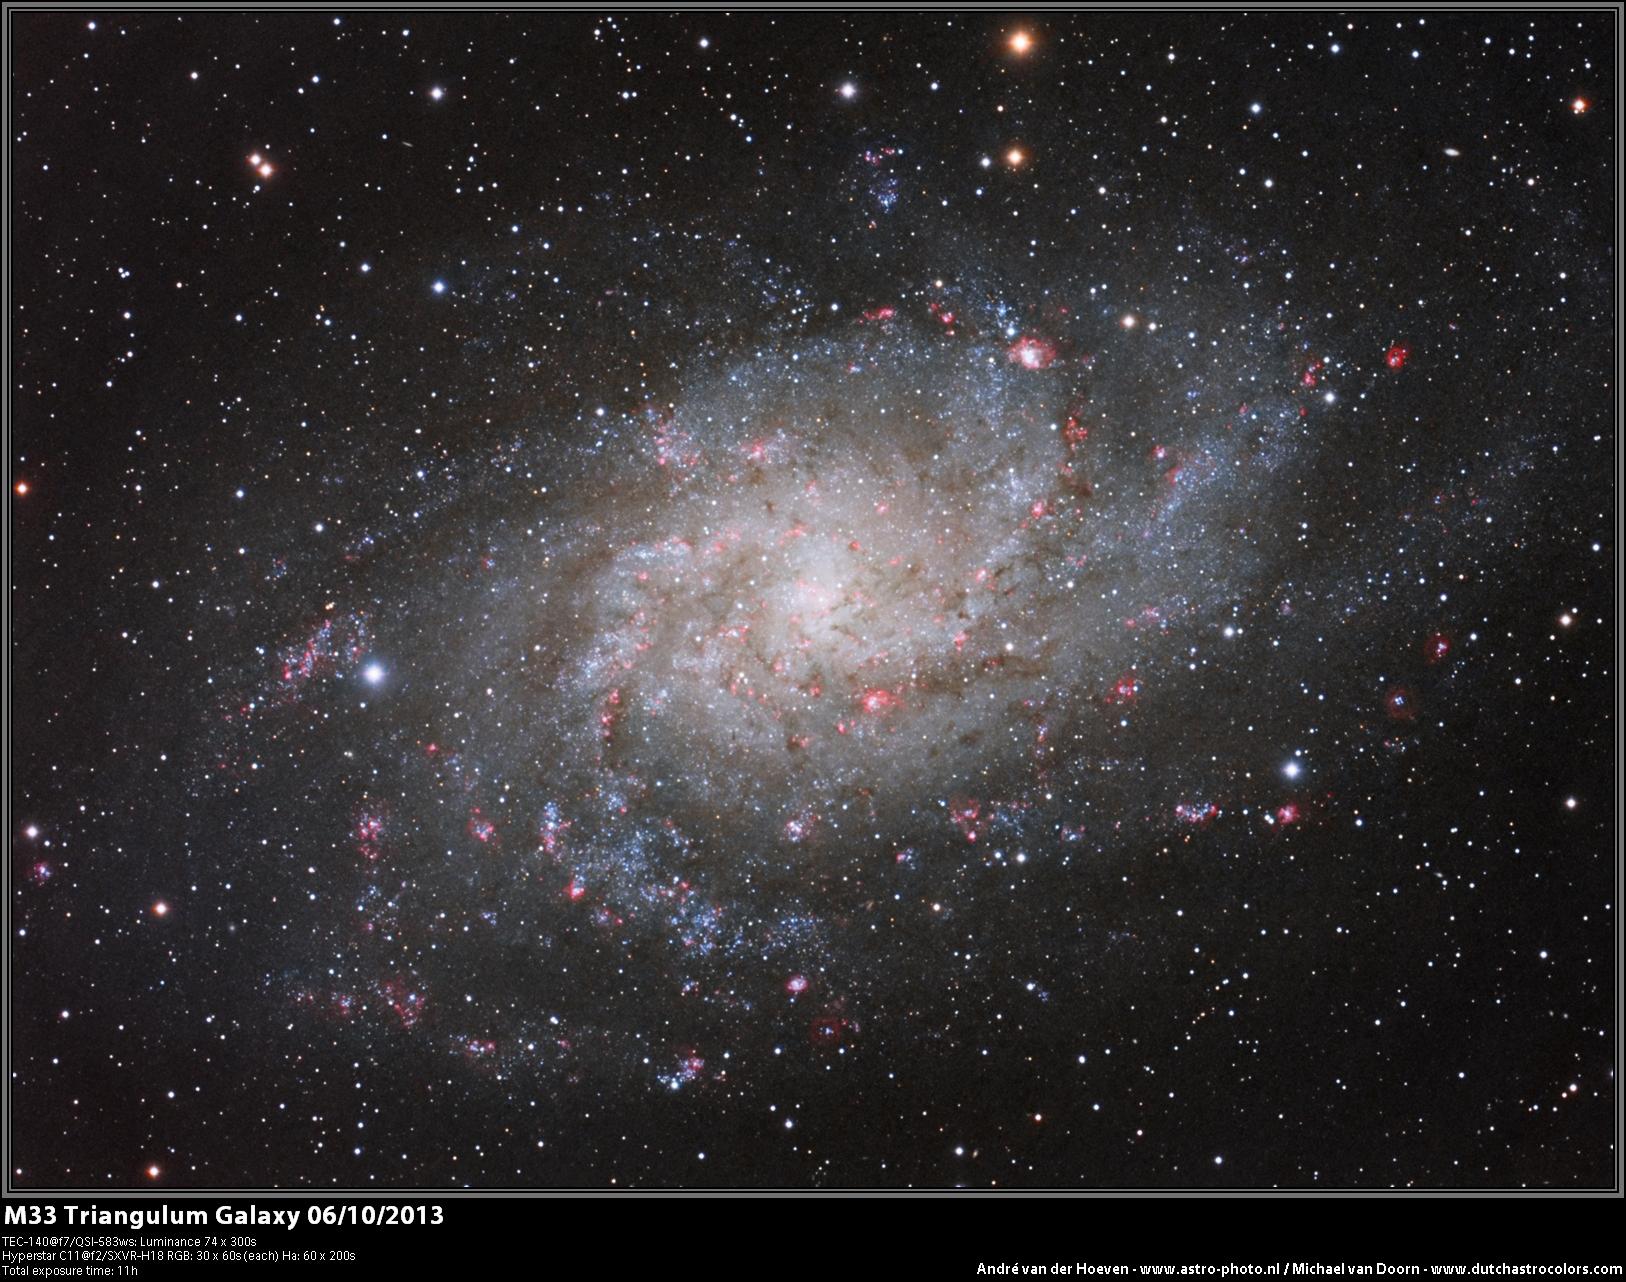 Stargazing Duo Snaps Gorgeous Photo of Triangulum Galaxy